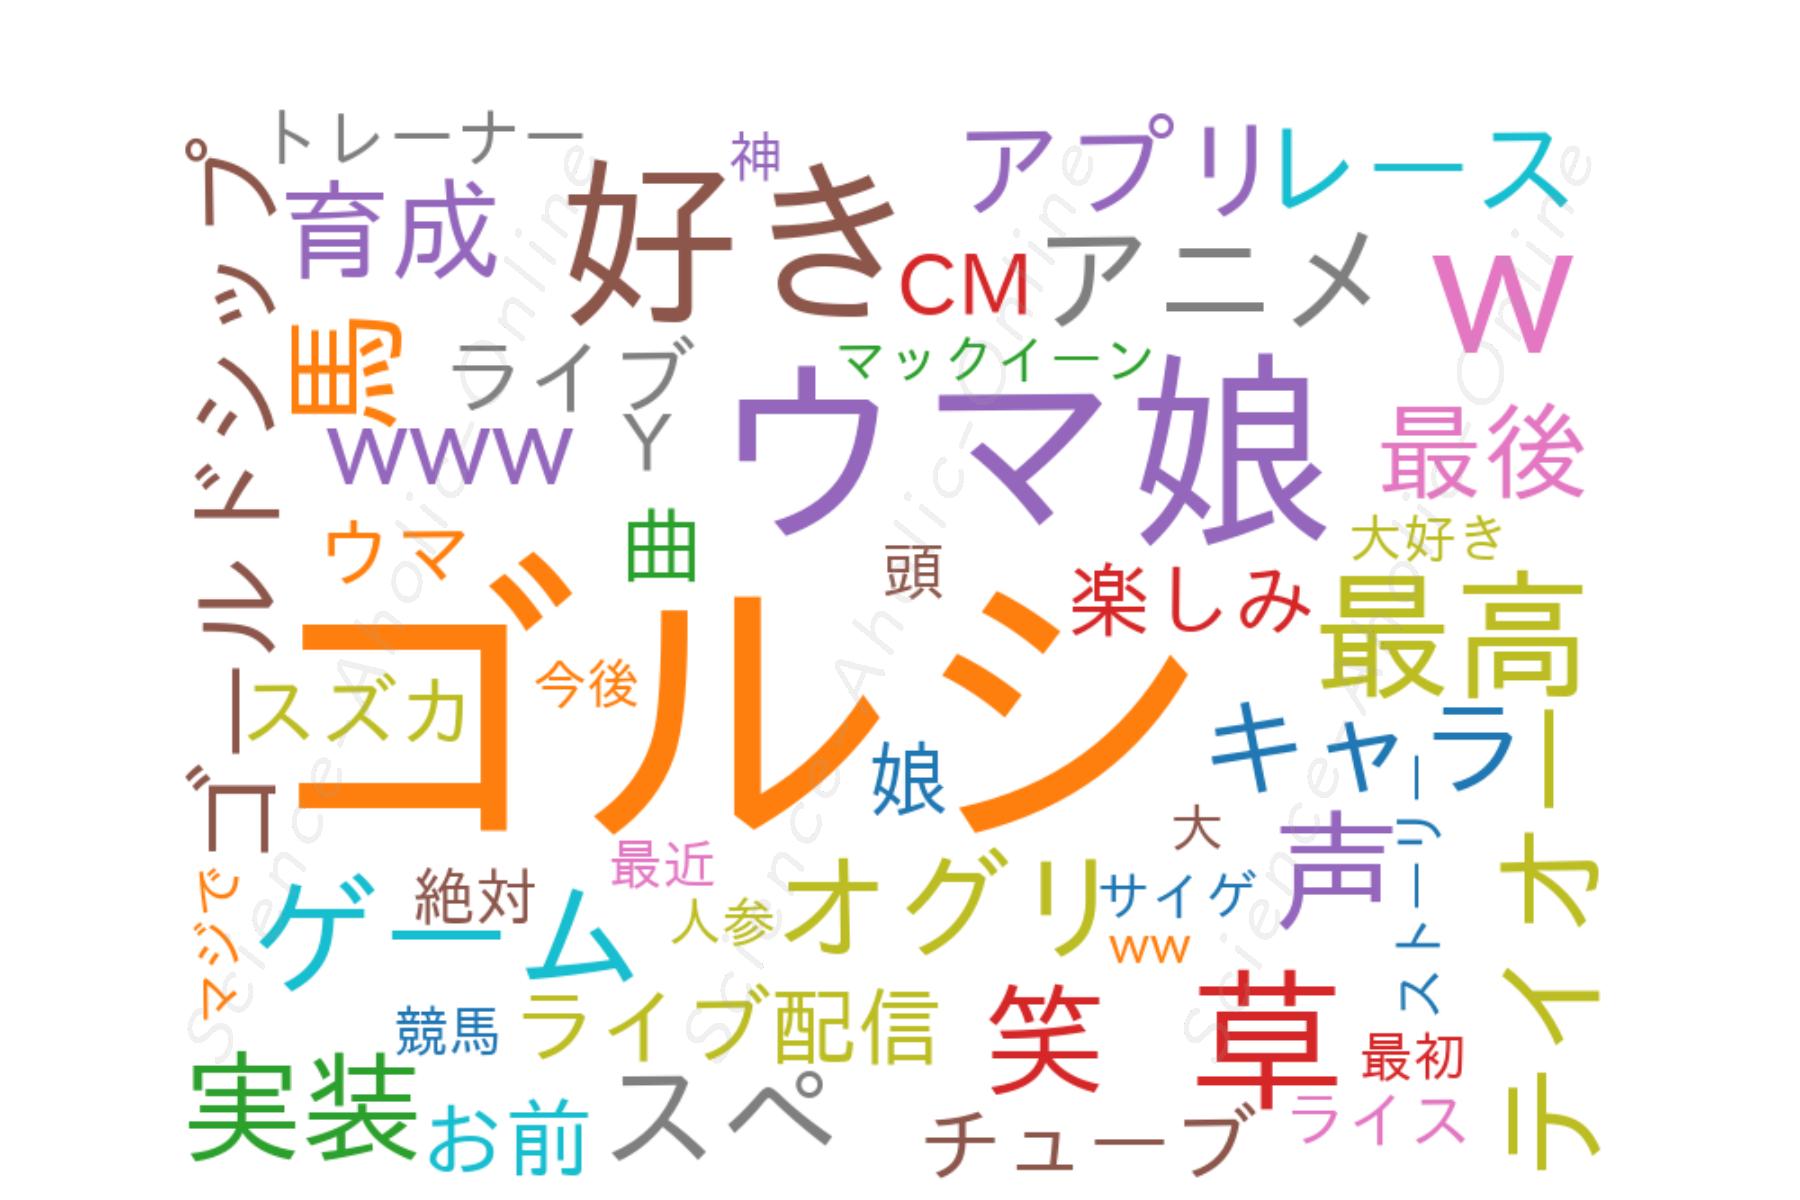 https://science-aholic-online.com/wp-content/uploads/2020/08/wordcloud_ぱかチューブっ!.png